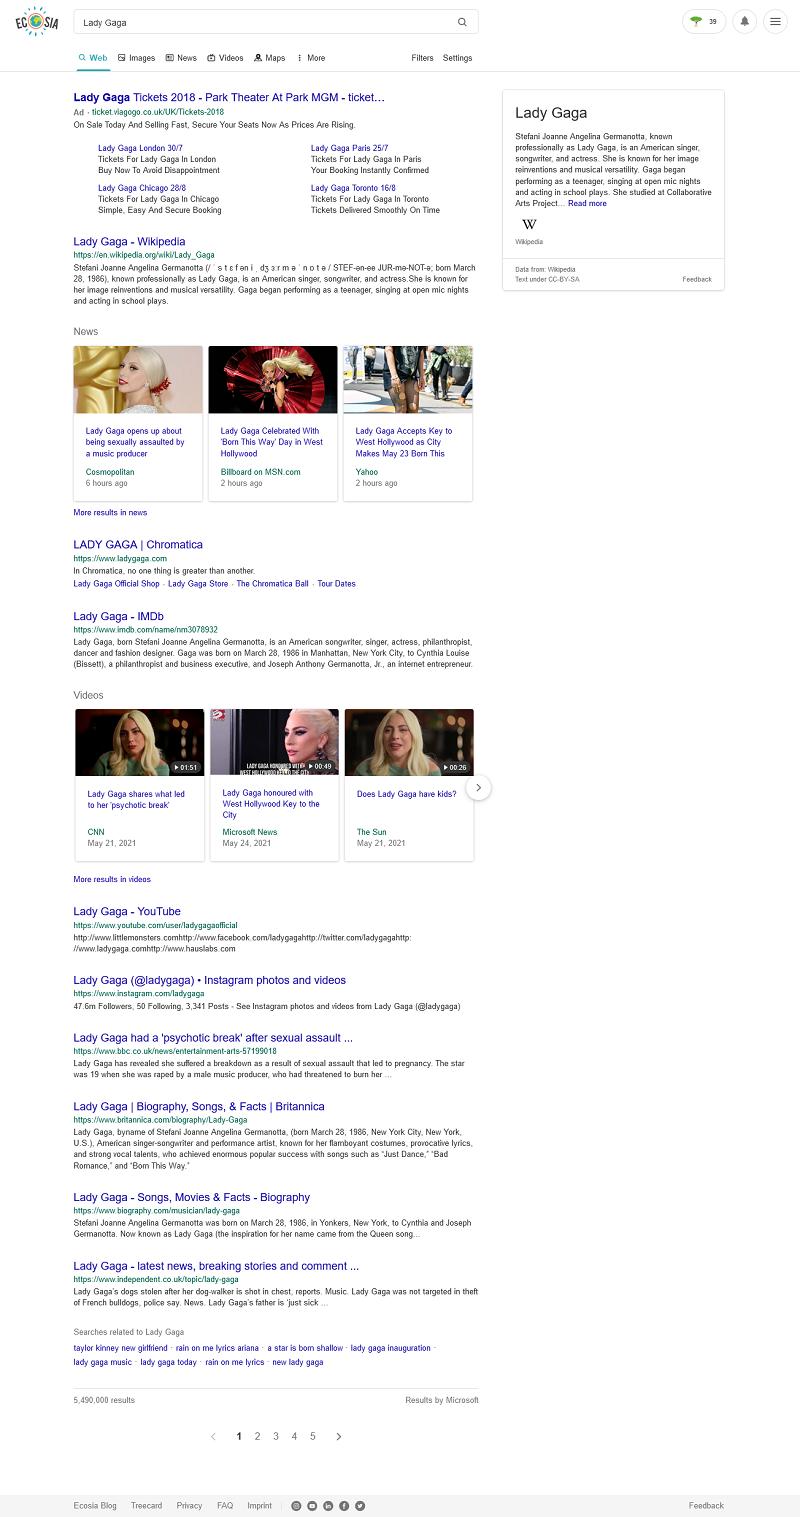 Ecosia's search results for 'Lady Gaga'